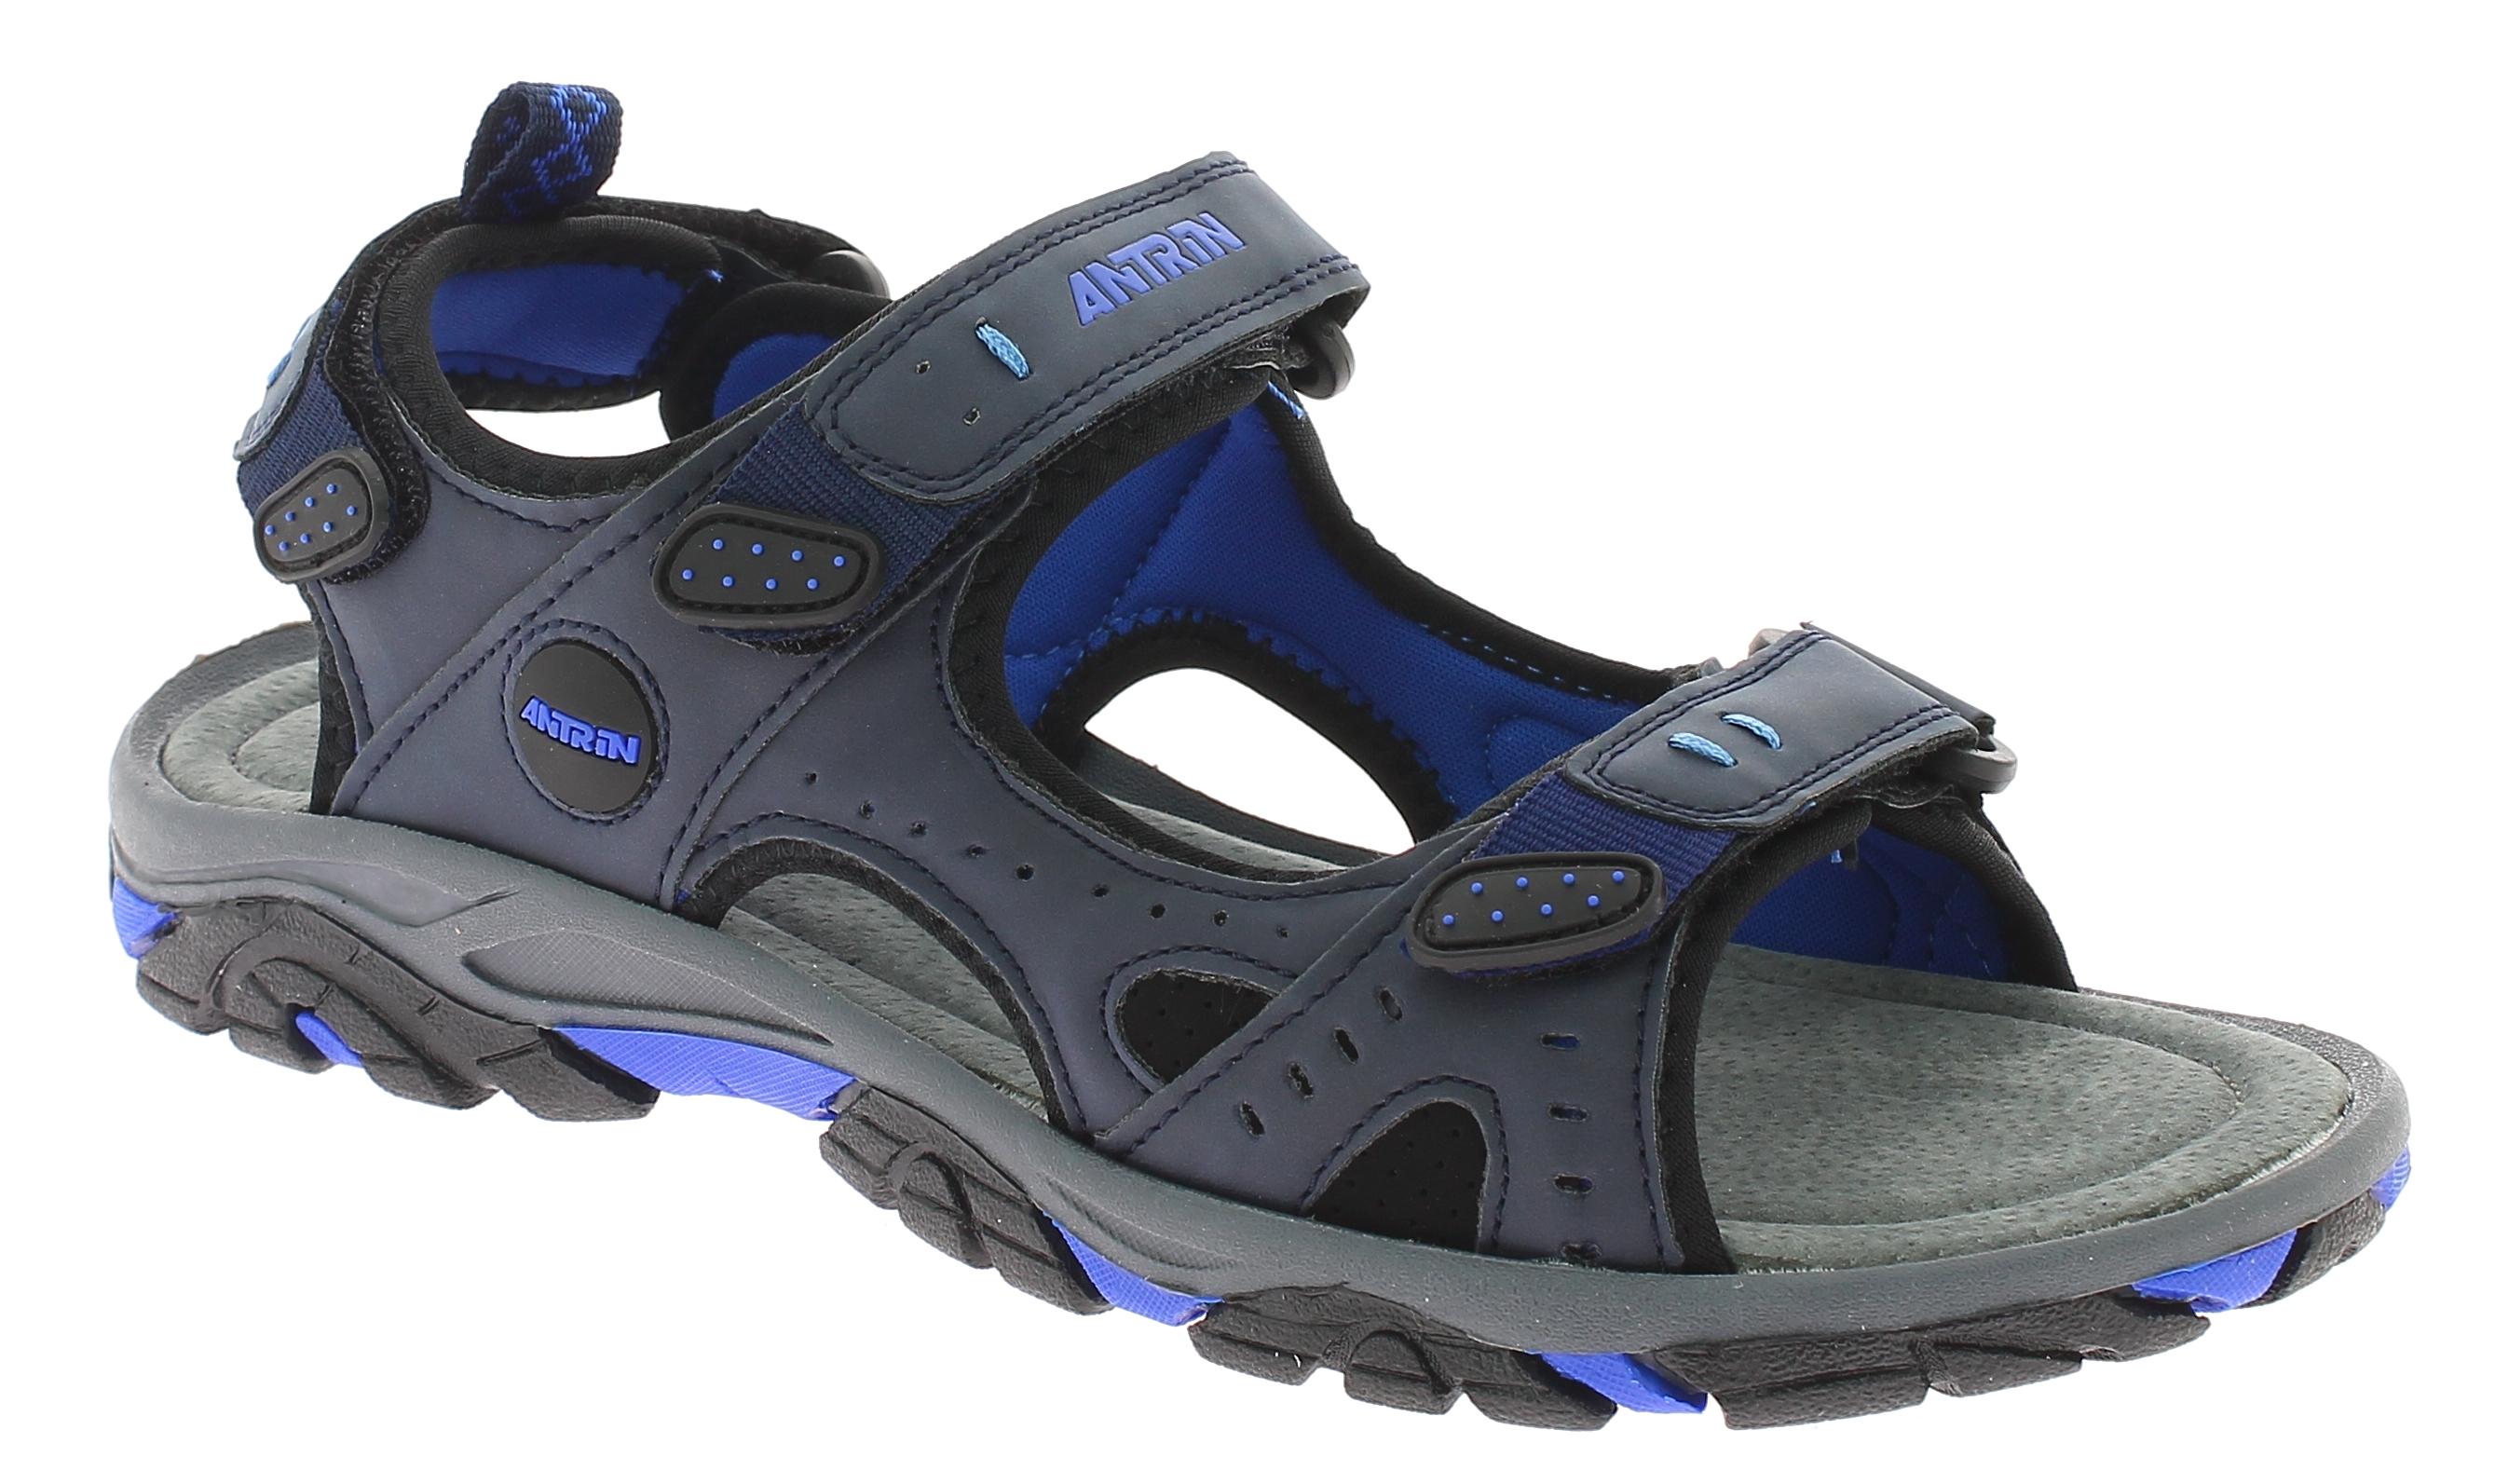 ANTRIN Ανδρικό Πέδιλο TORONTO-105 Μπλέ - Μπλε - TORONTO-105 BLUE-blue-43/4/10/91